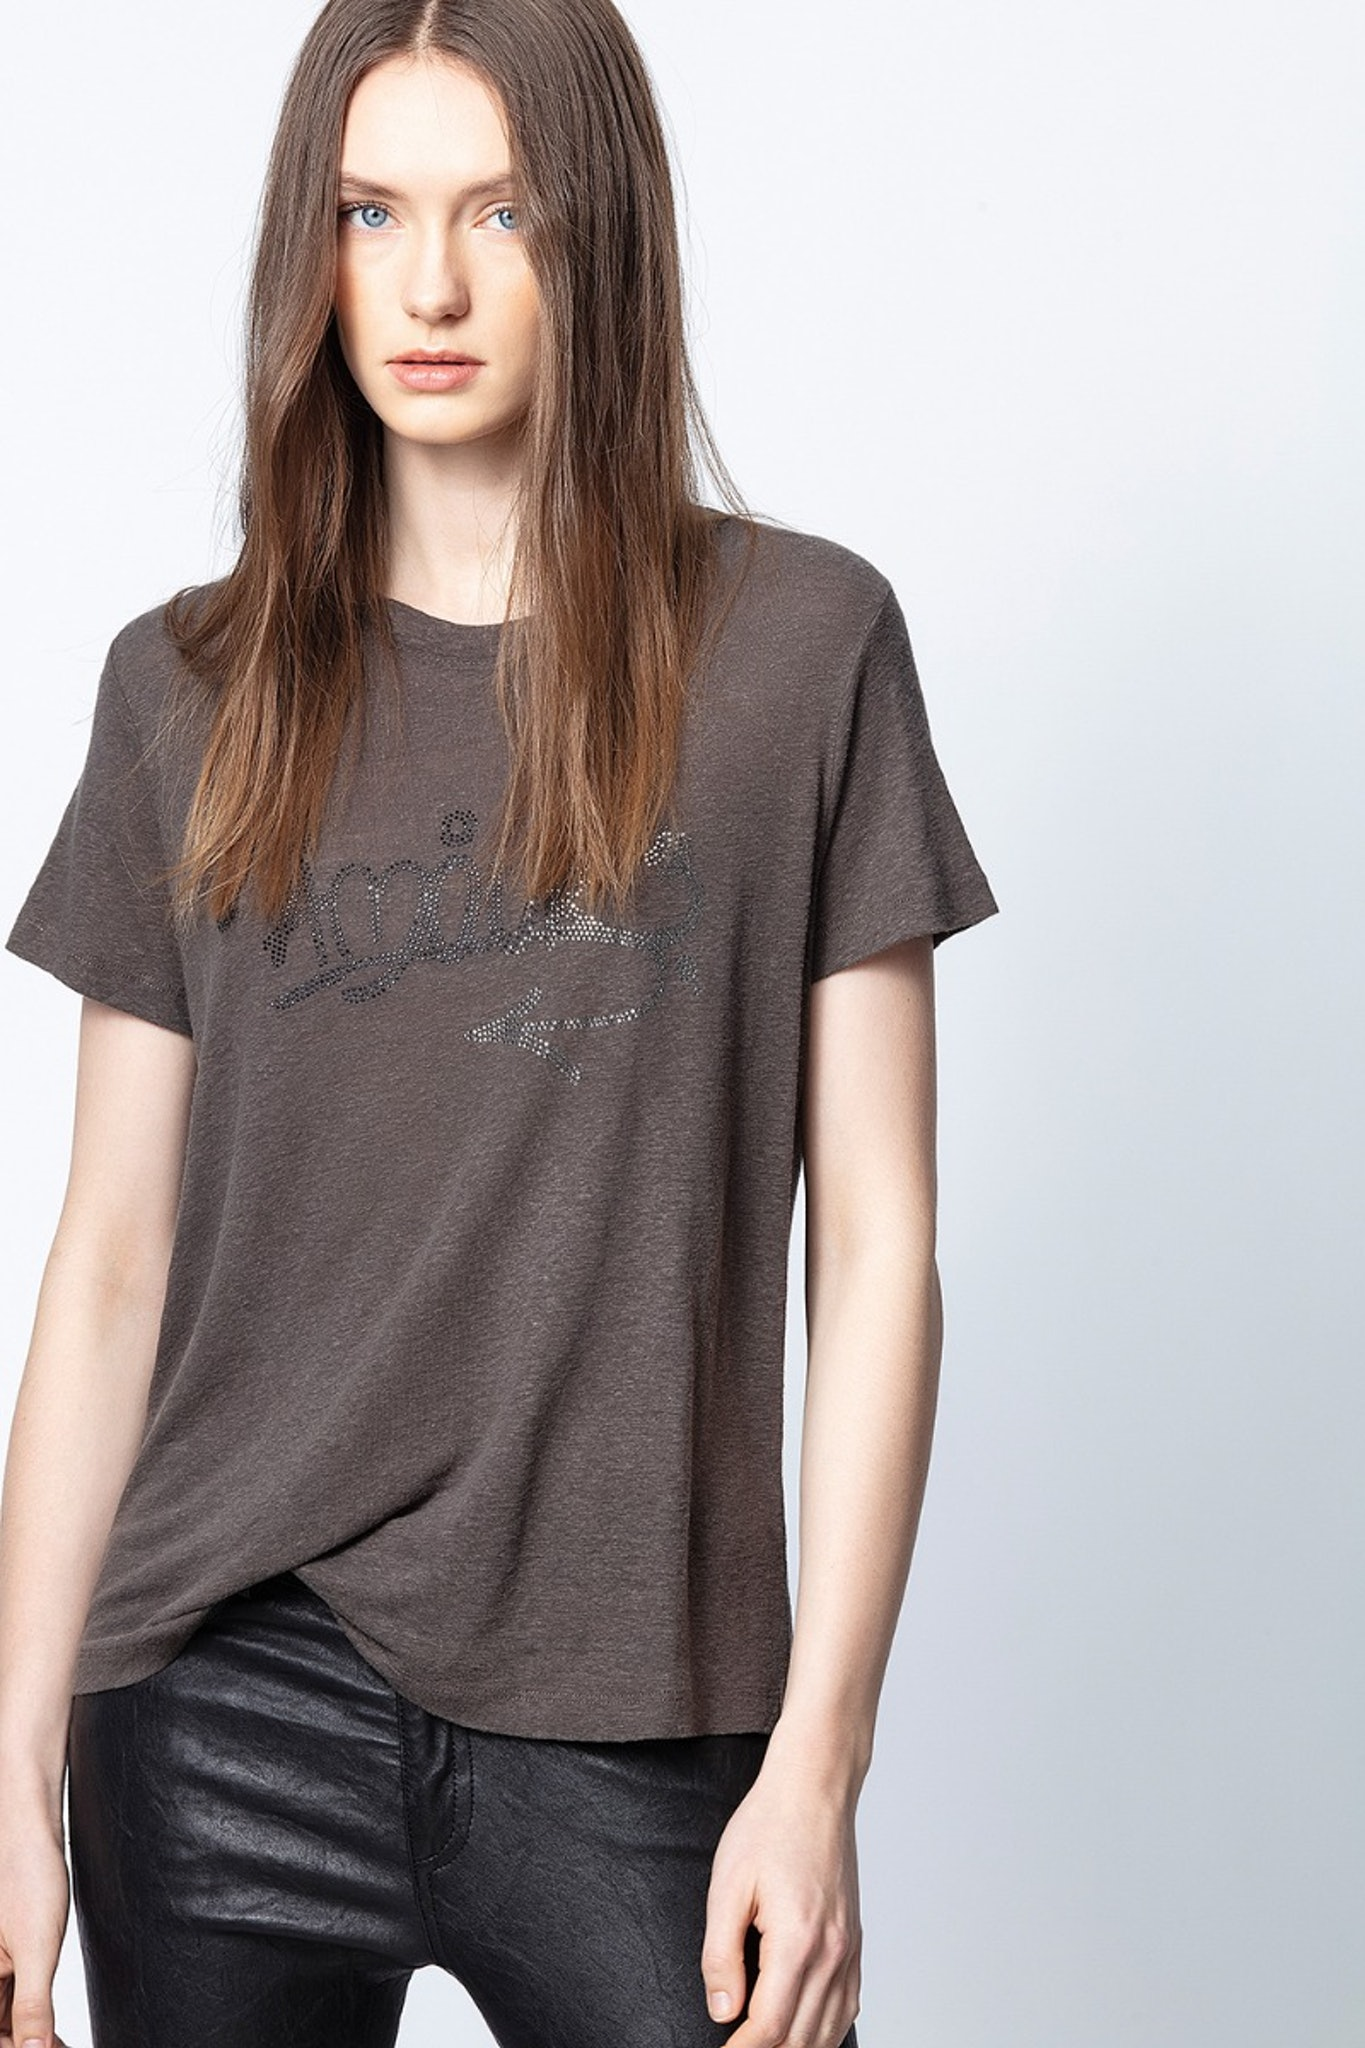 Azedi Strass Jormi T-Shirt